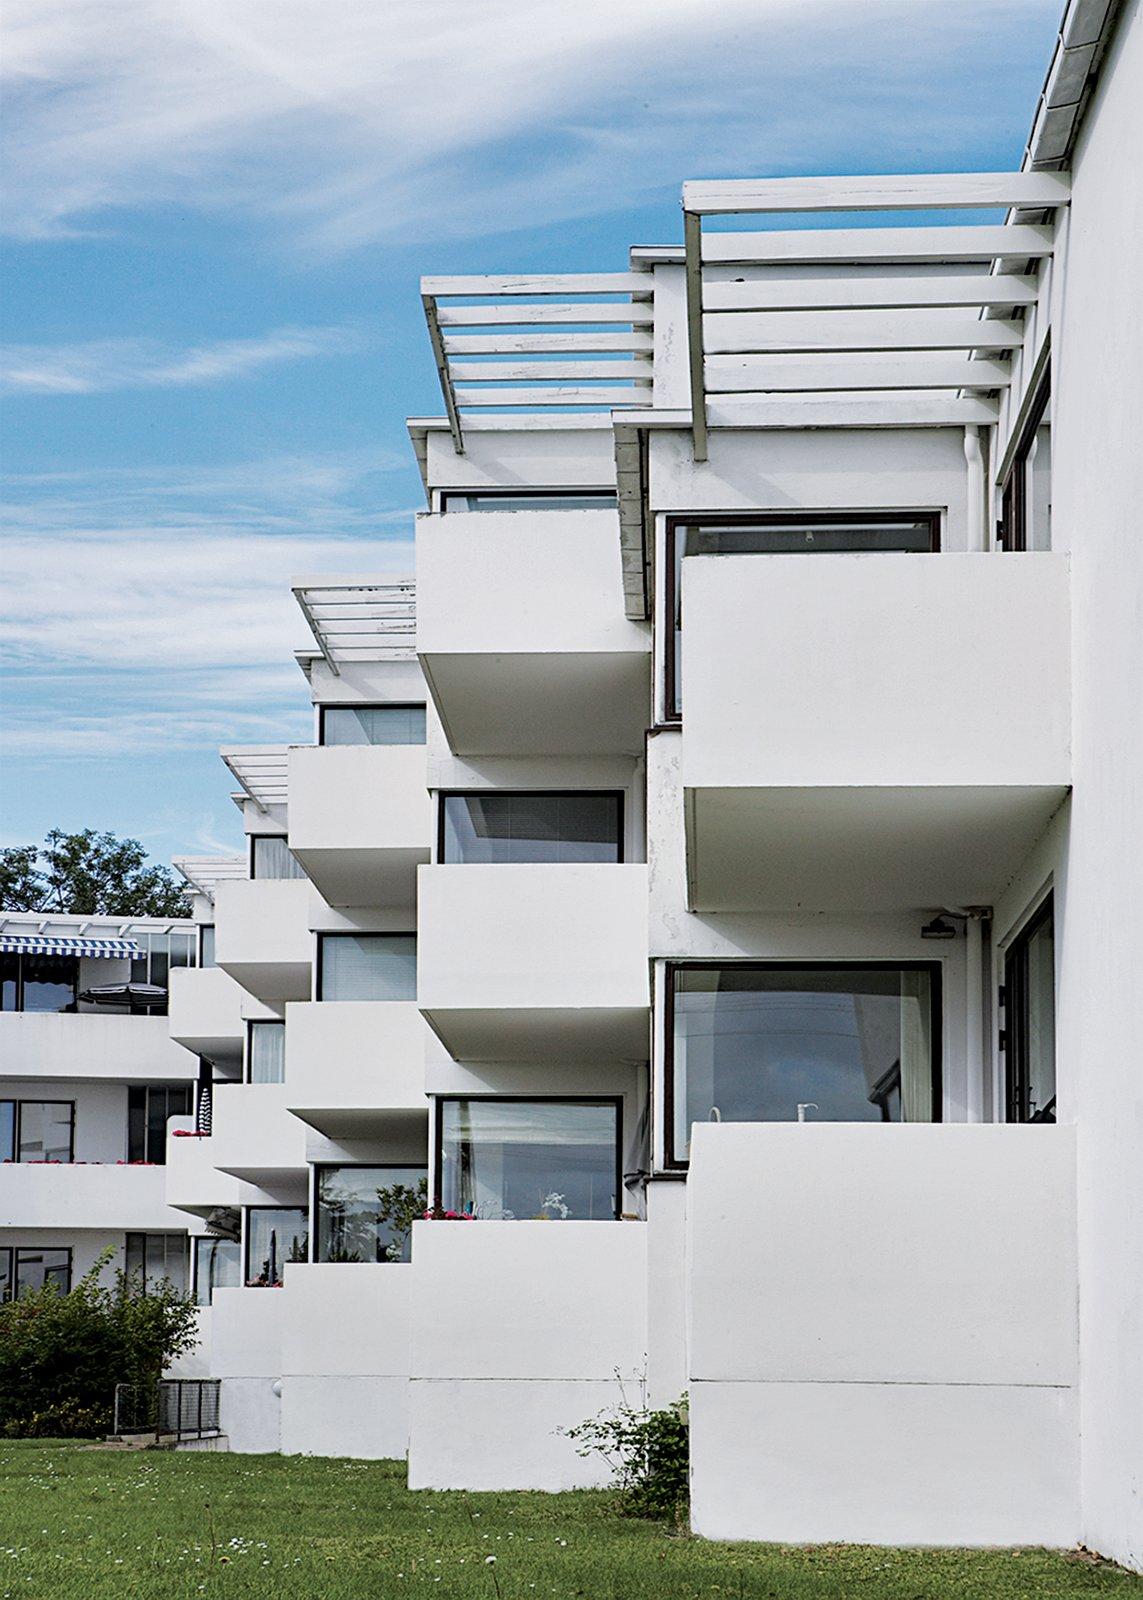 Bellavista, Arne Jacoben's 1931–34 functionalist housing complex at the beachside suburb of Klampenborg.  Photo 9 of 10 in Copenhagen, Denmark